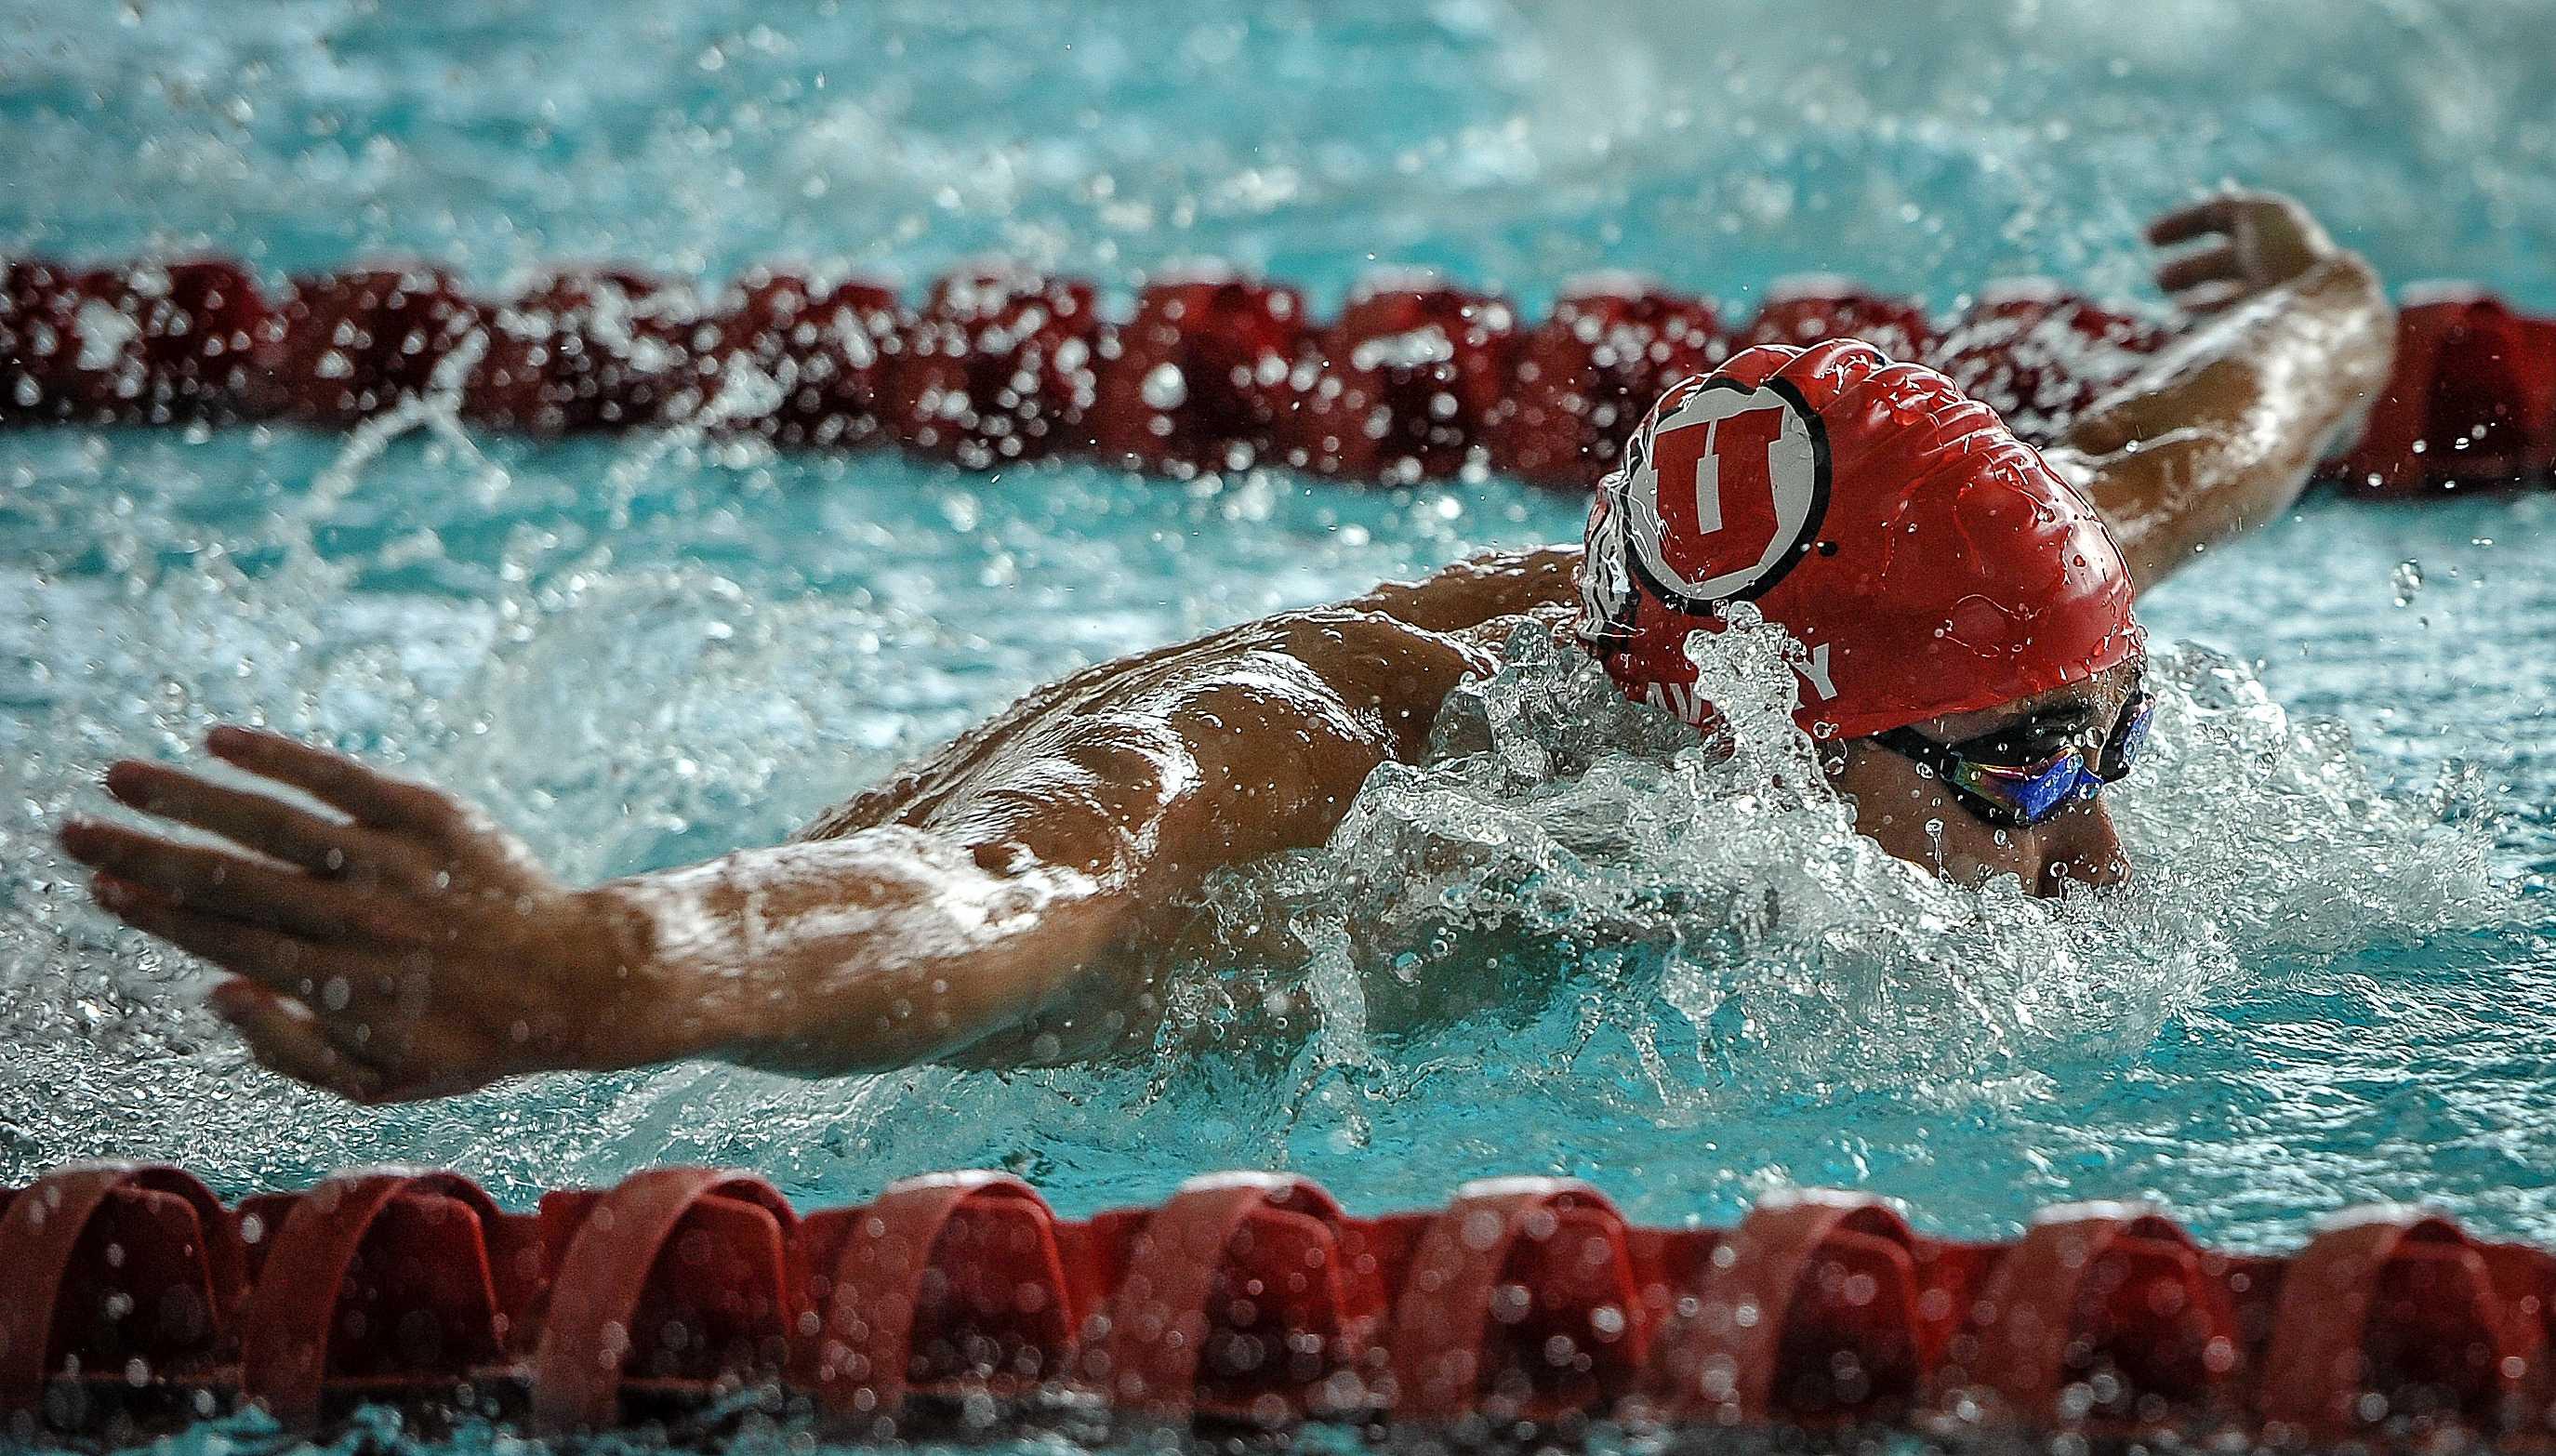 Utah's Cole Avery swims against Brigham Young University at the Natatorium in Salt Lake City, UT on Saturday, Jan. 27, 2018  (Photo by Adam Fondren | Daily Utah Chronicle)